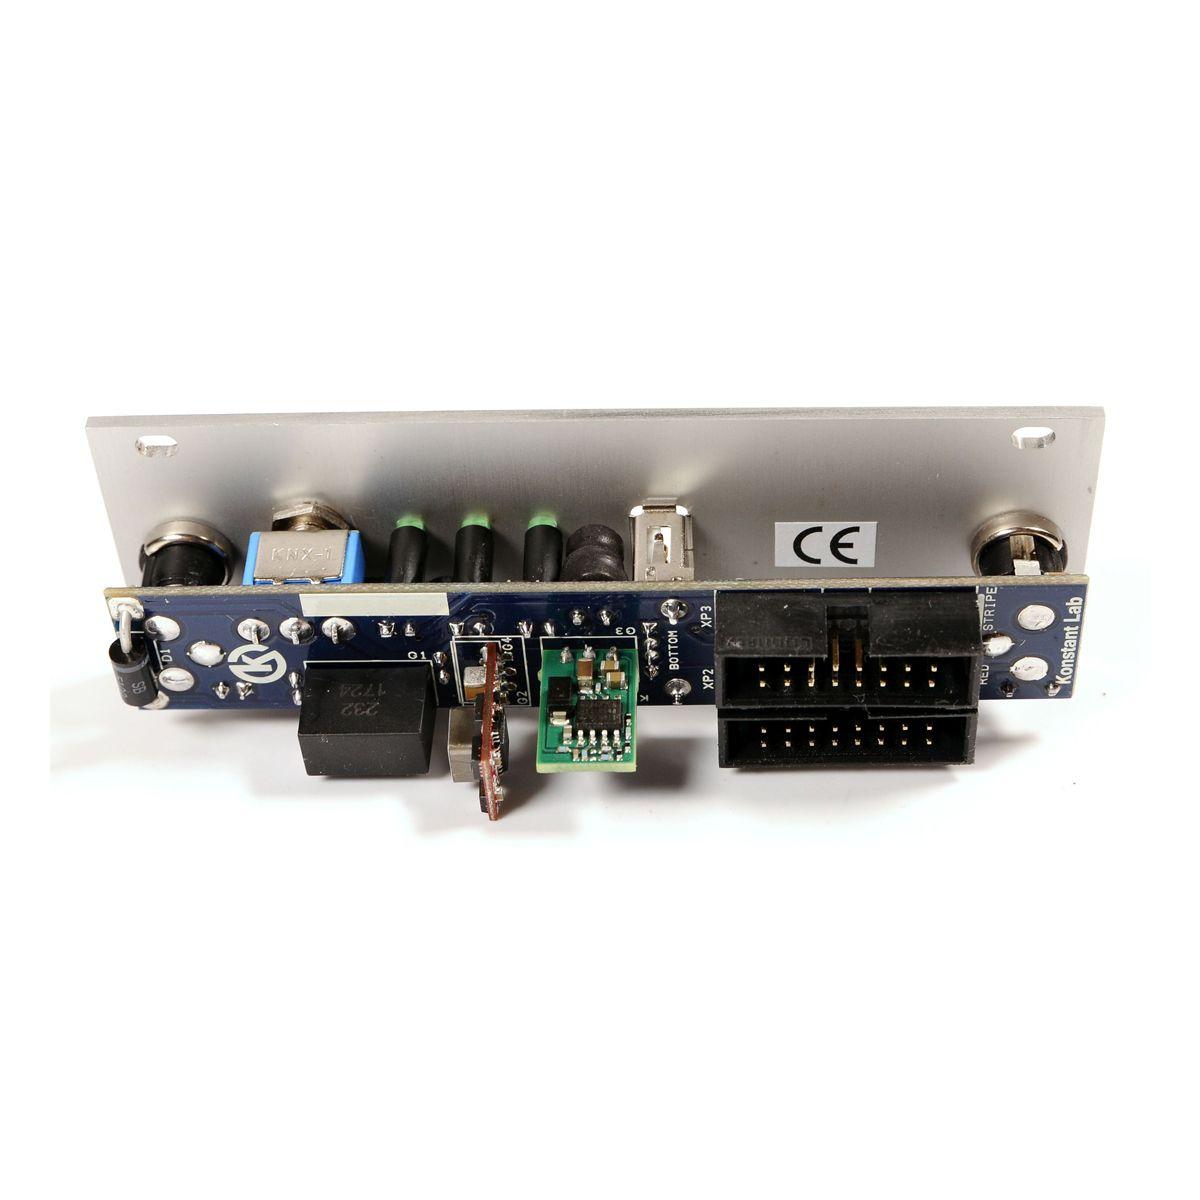 Konstant Lab 1U PWR Eurorack Power Module (Pulp Logic)